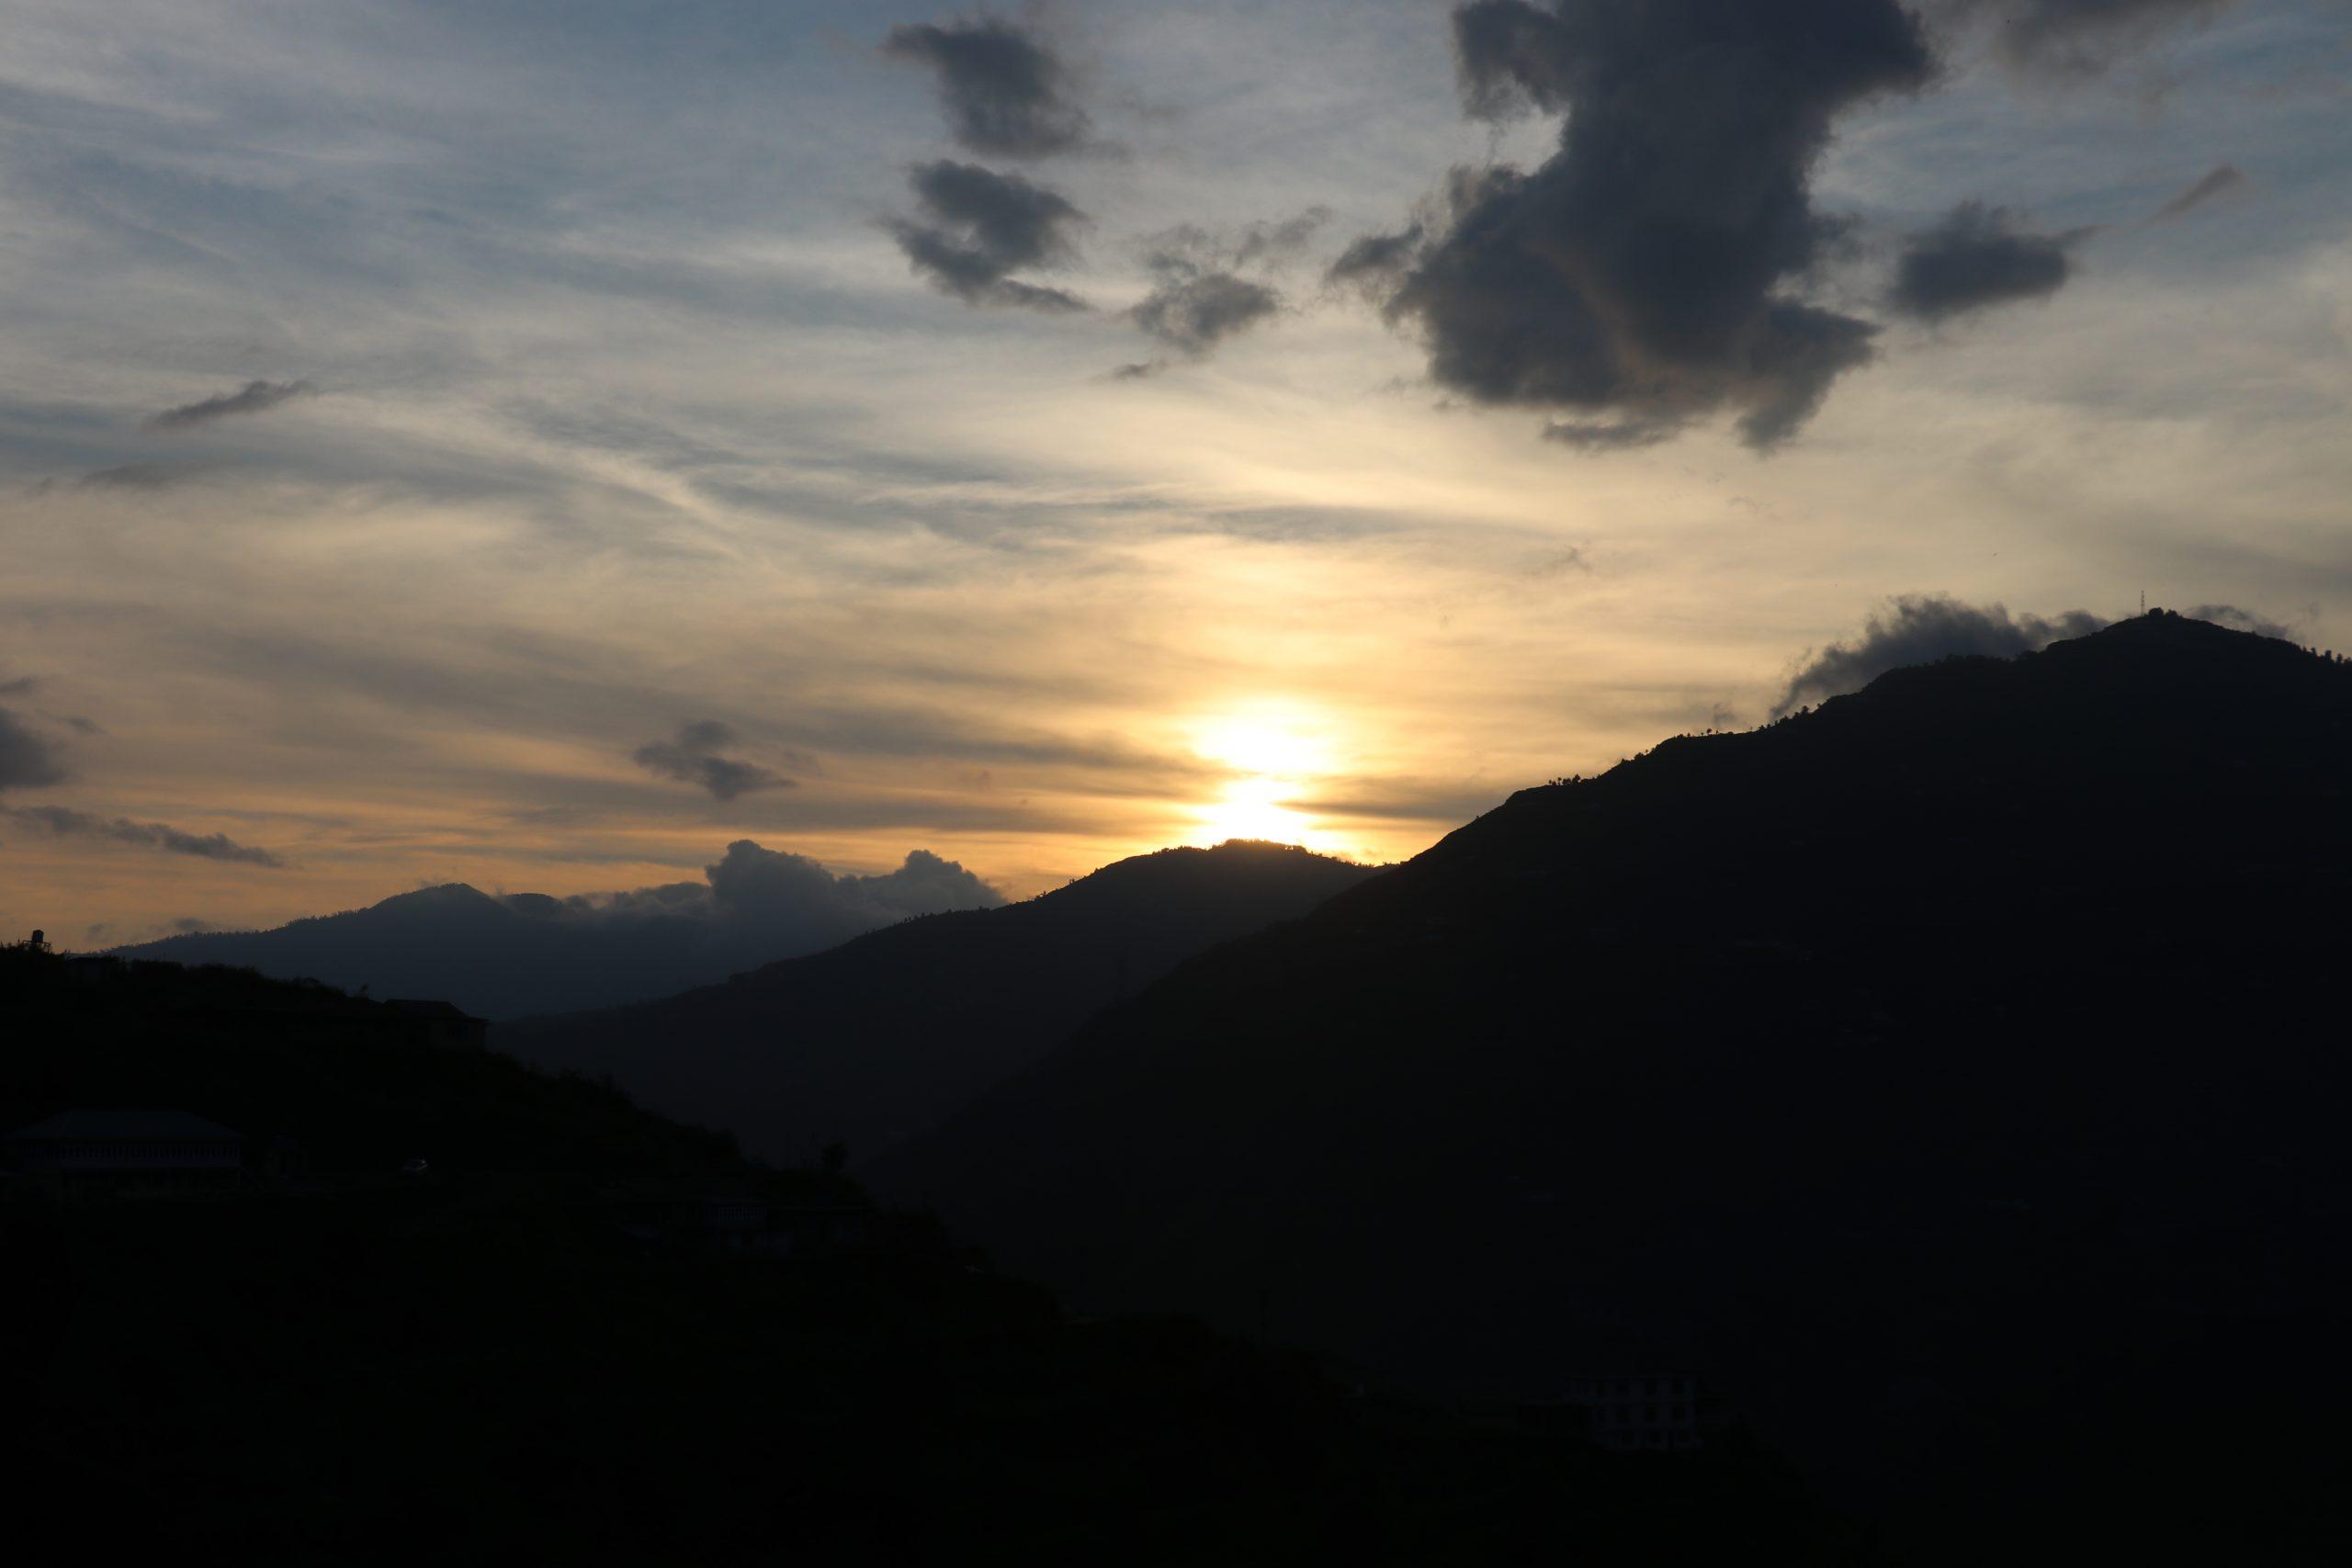 Sunrise Scenery on a Mountain